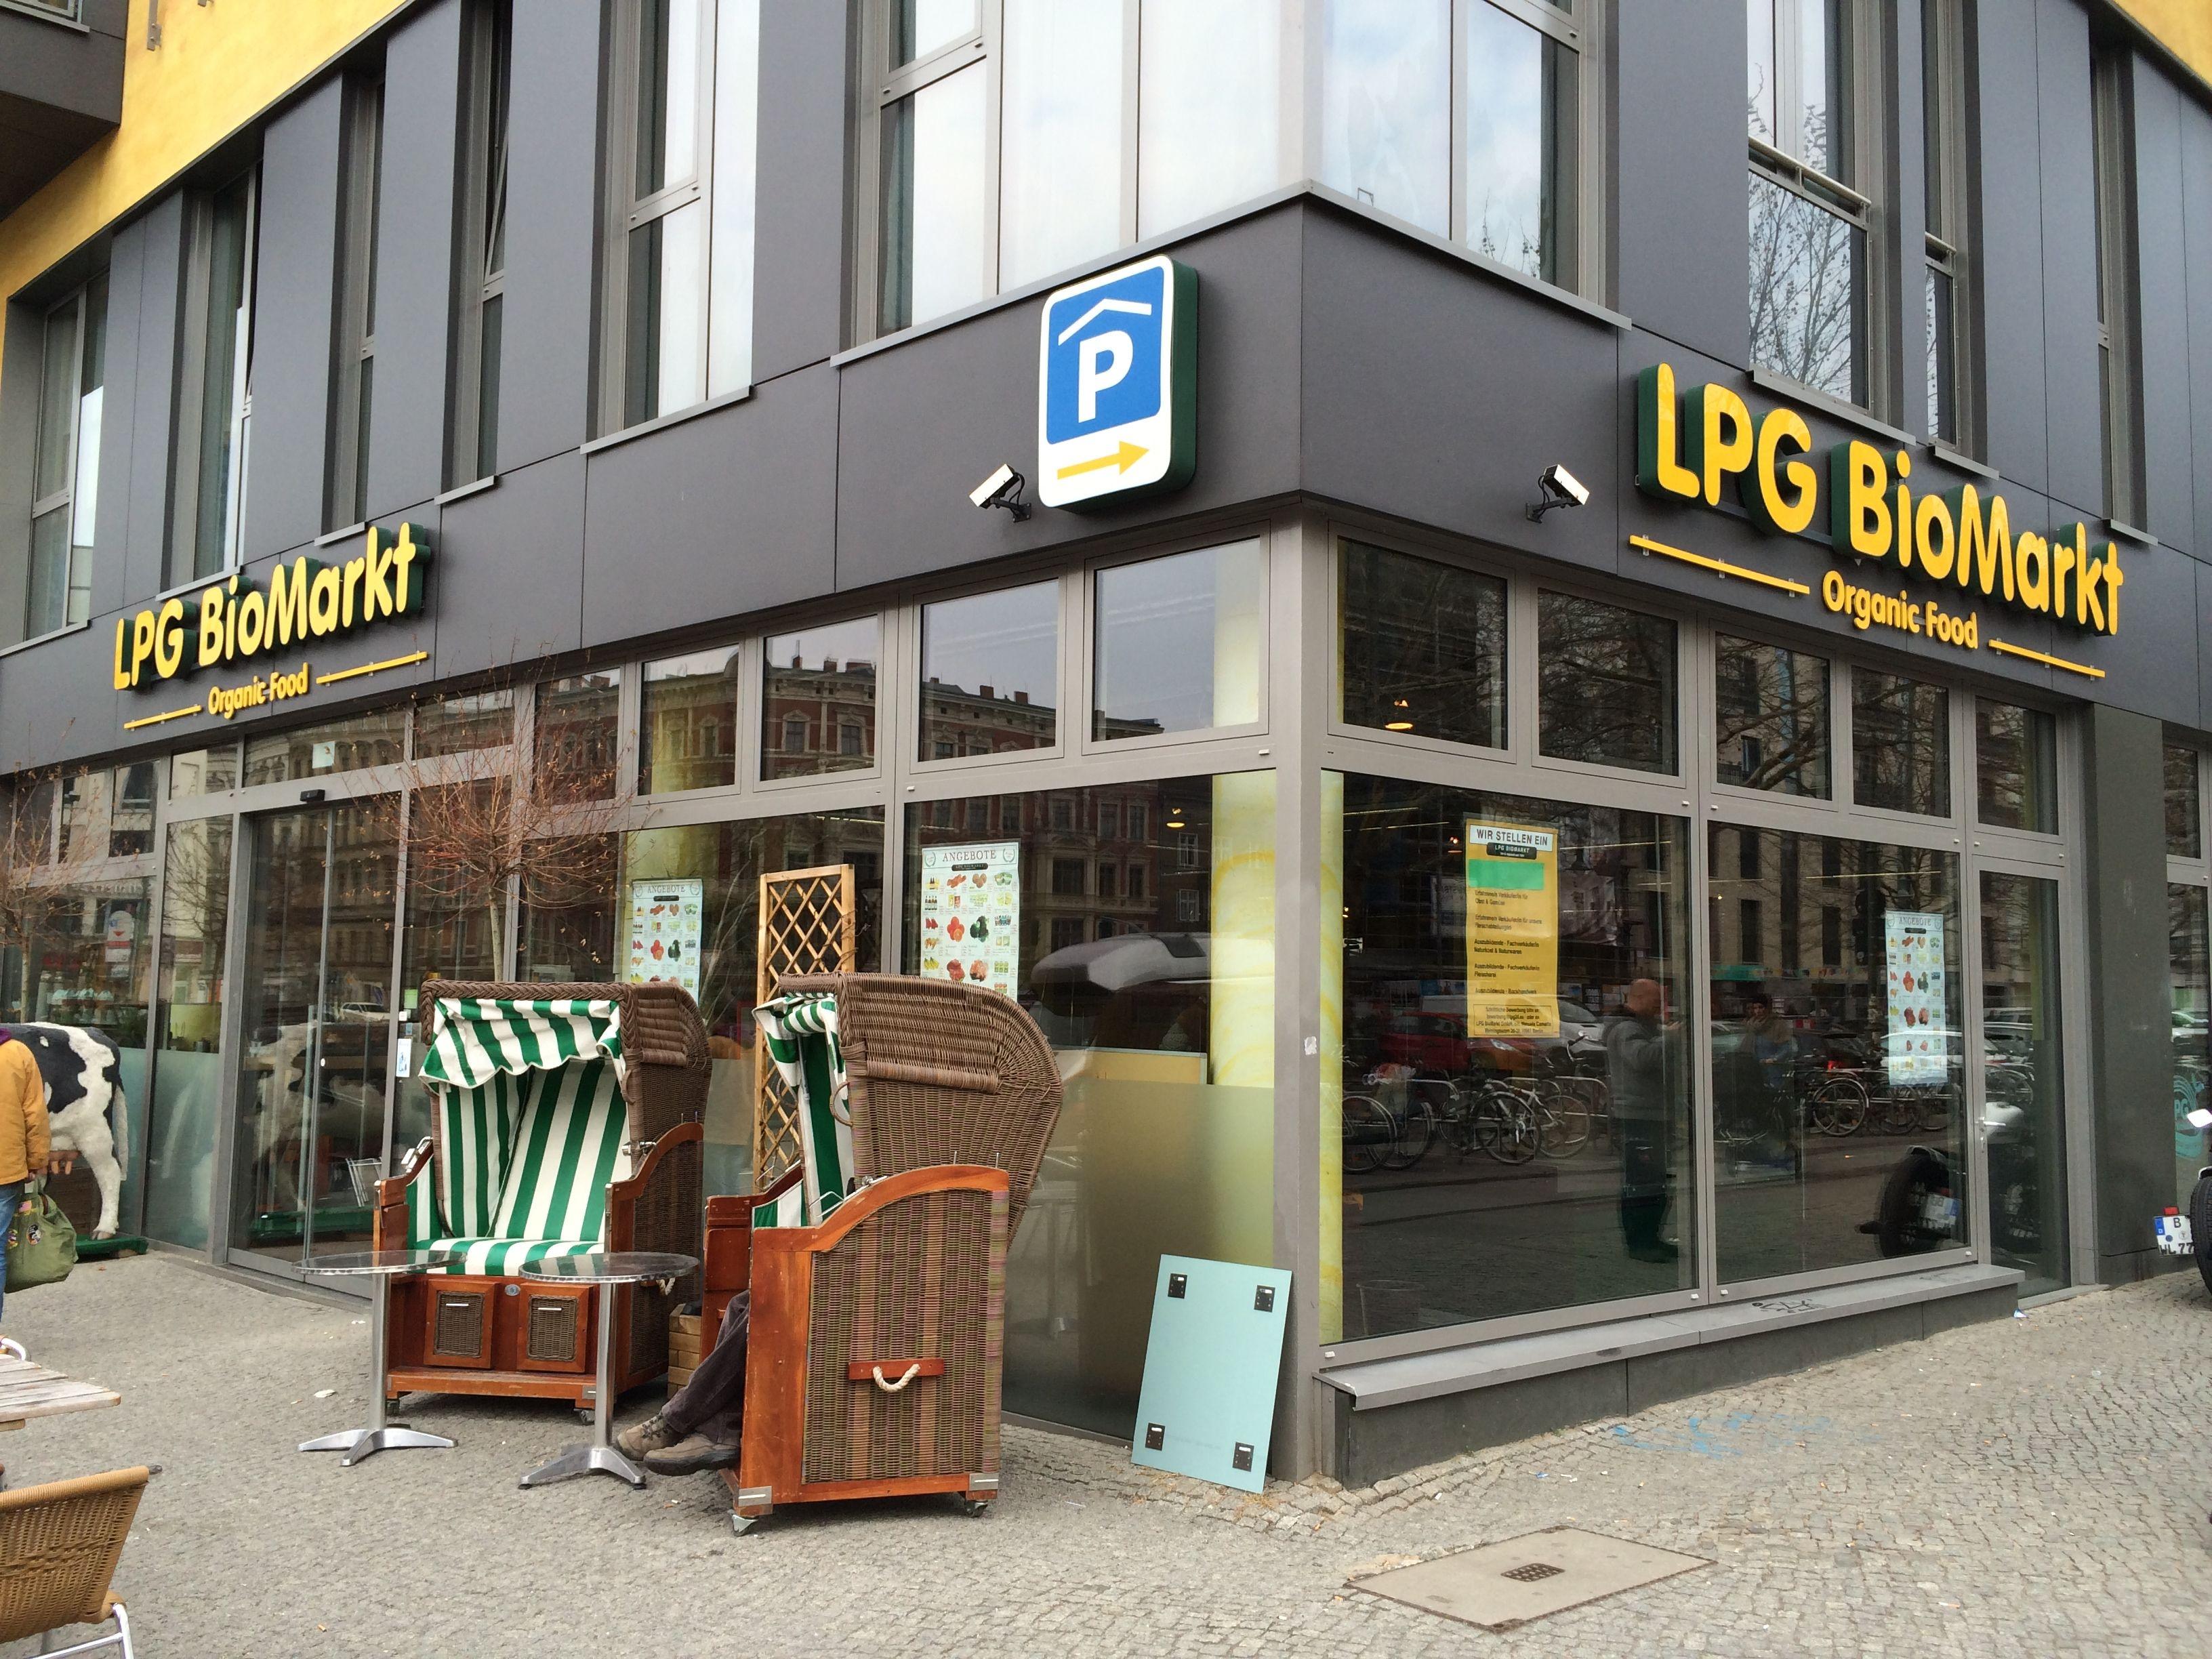 lpg biomarkt kologisk supermarked i berlin berlin guide berlin walking. Black Bedroom Furniture Sets. Home Design Ideas